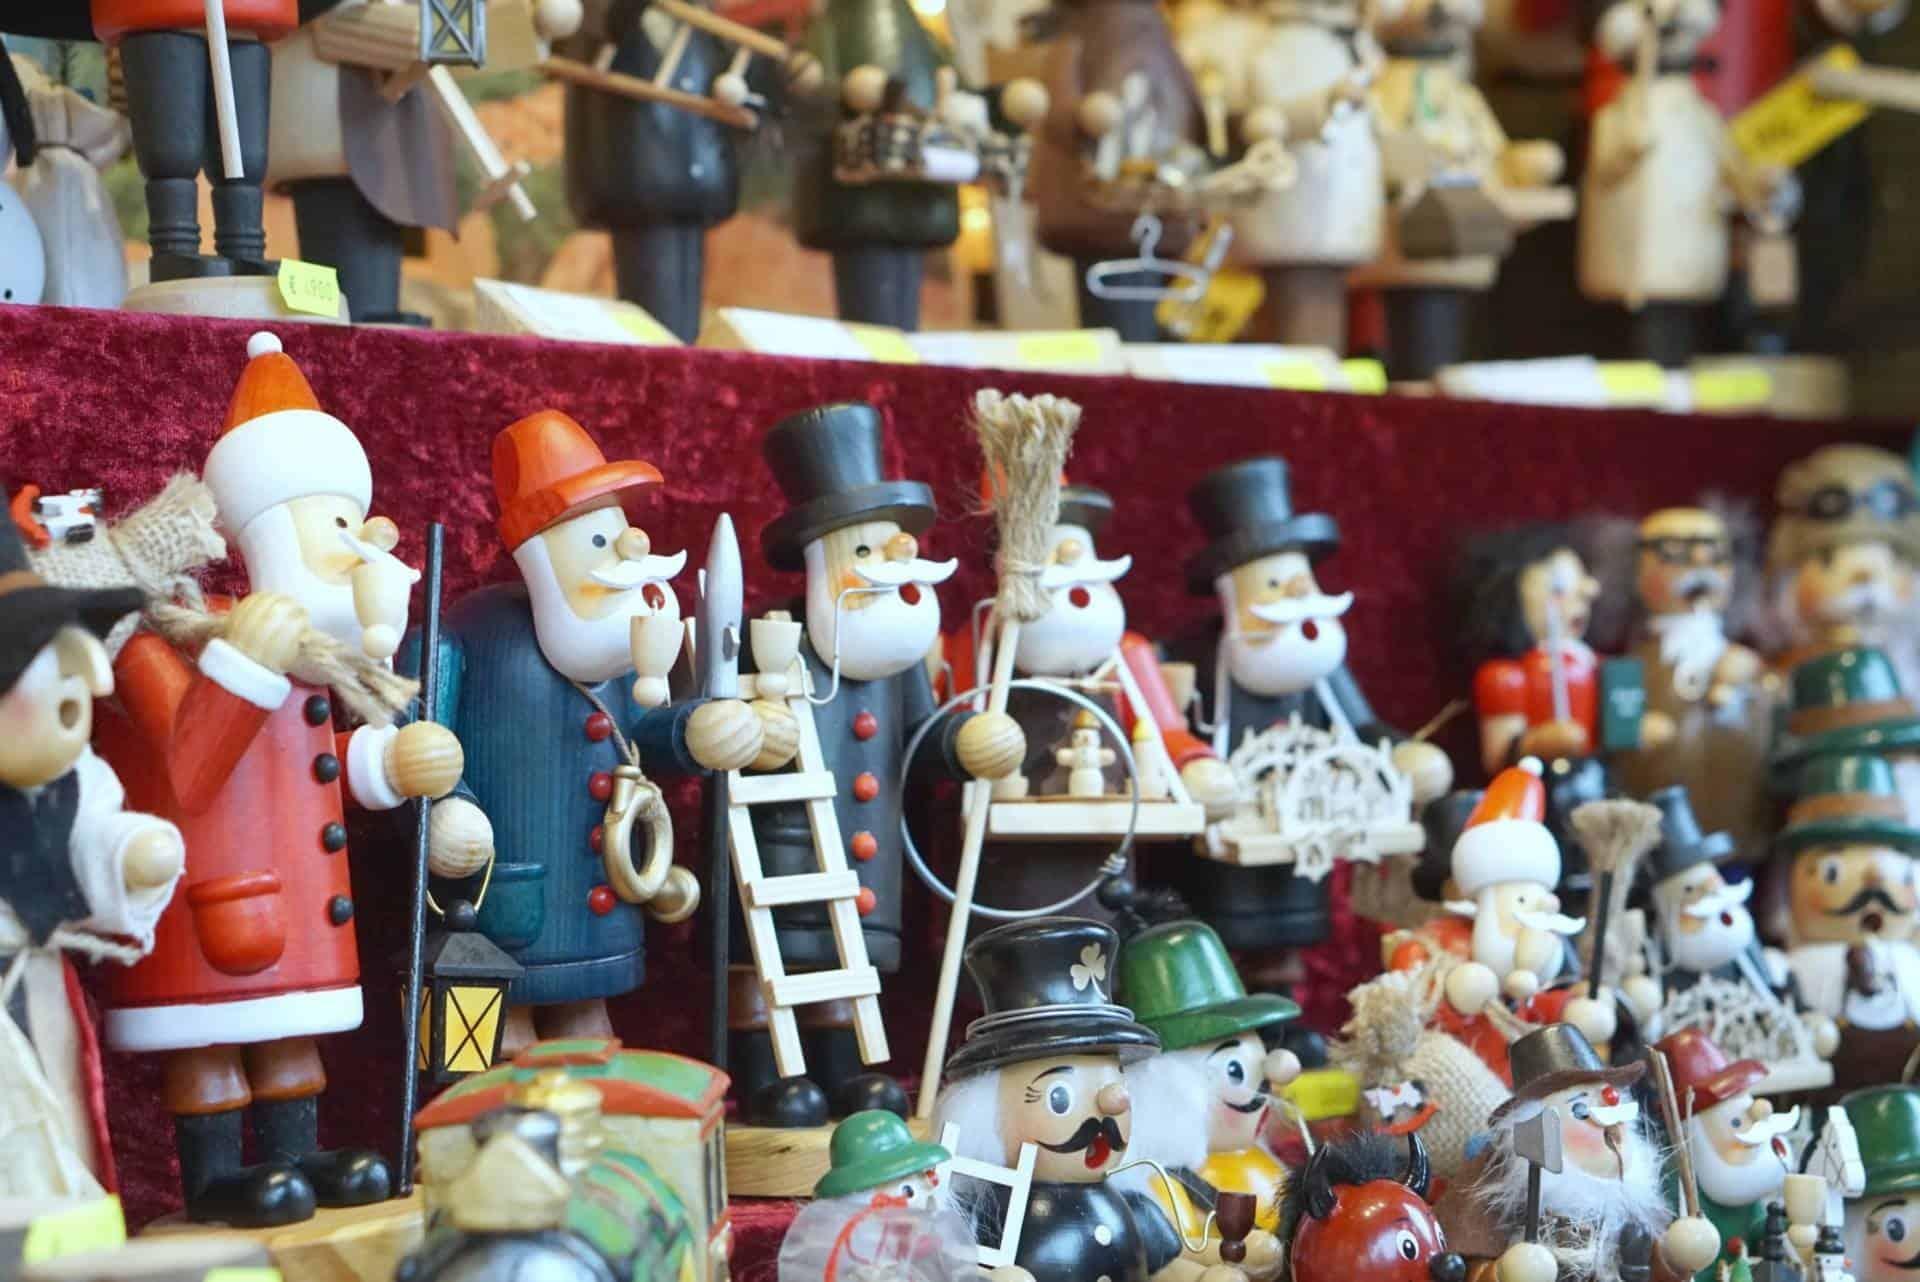 Esslingen Christmas Markets In Stuttgart, Germany www.extraordinarychaos.com